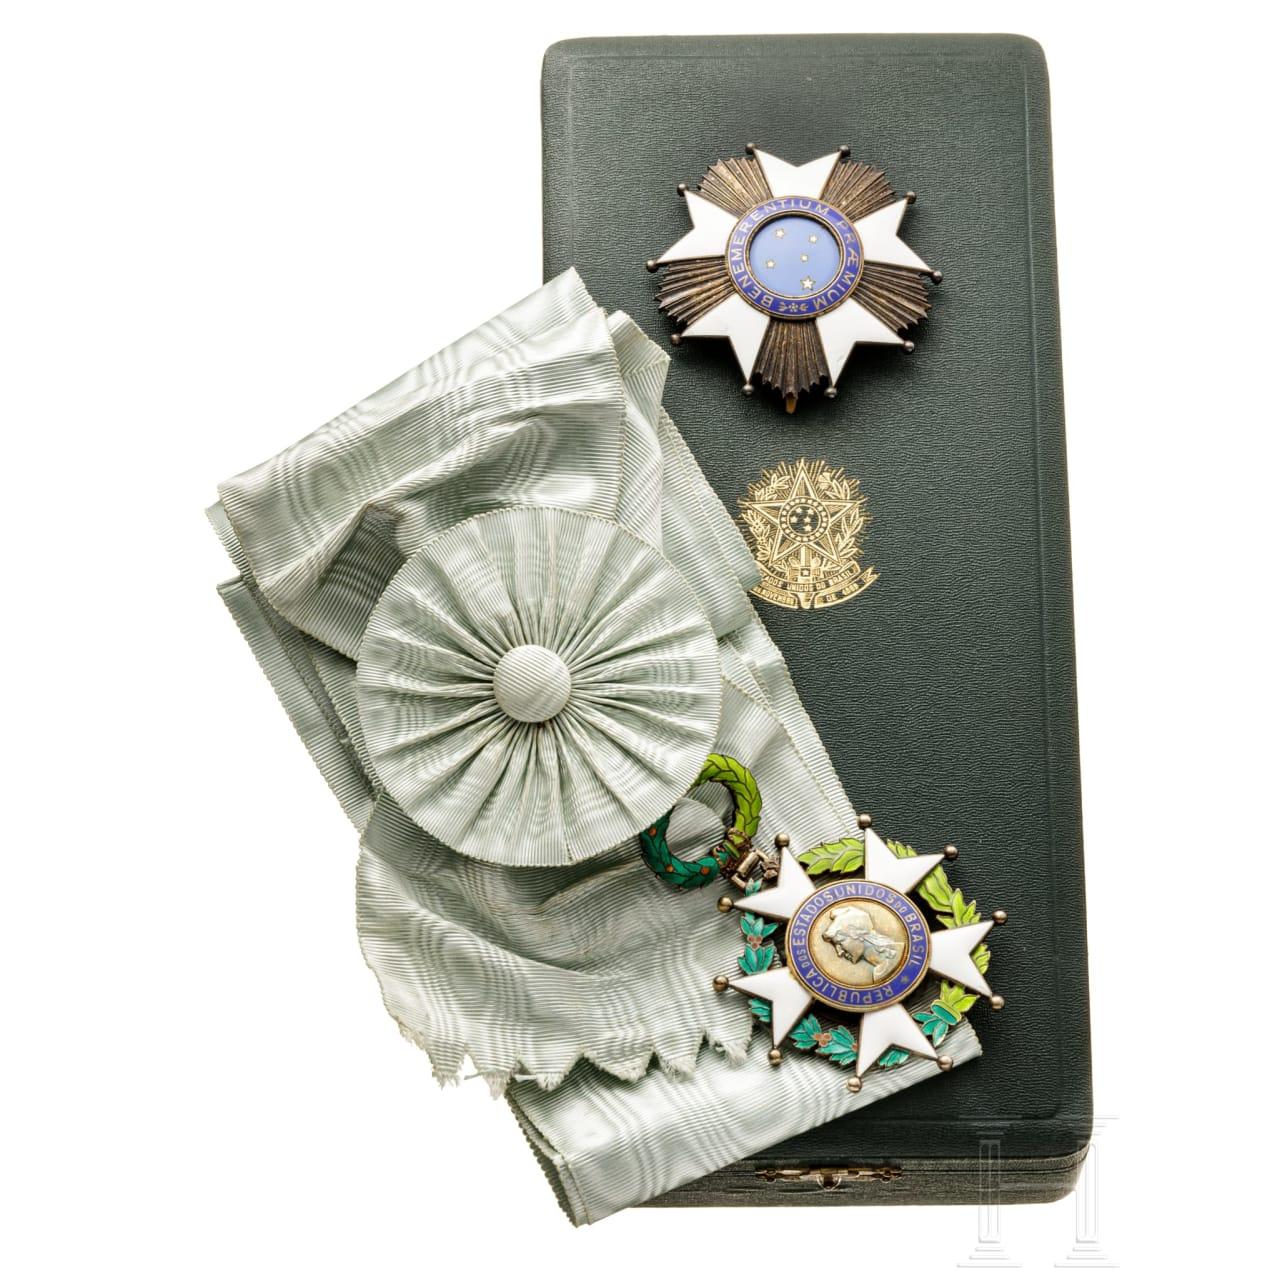 Brasilien - Nationaler Orden vom Kreuz des Südens (Ordem Nacional do Cruzeiro do Sul) 1. Klasse im Etui, 20. Jhdt.